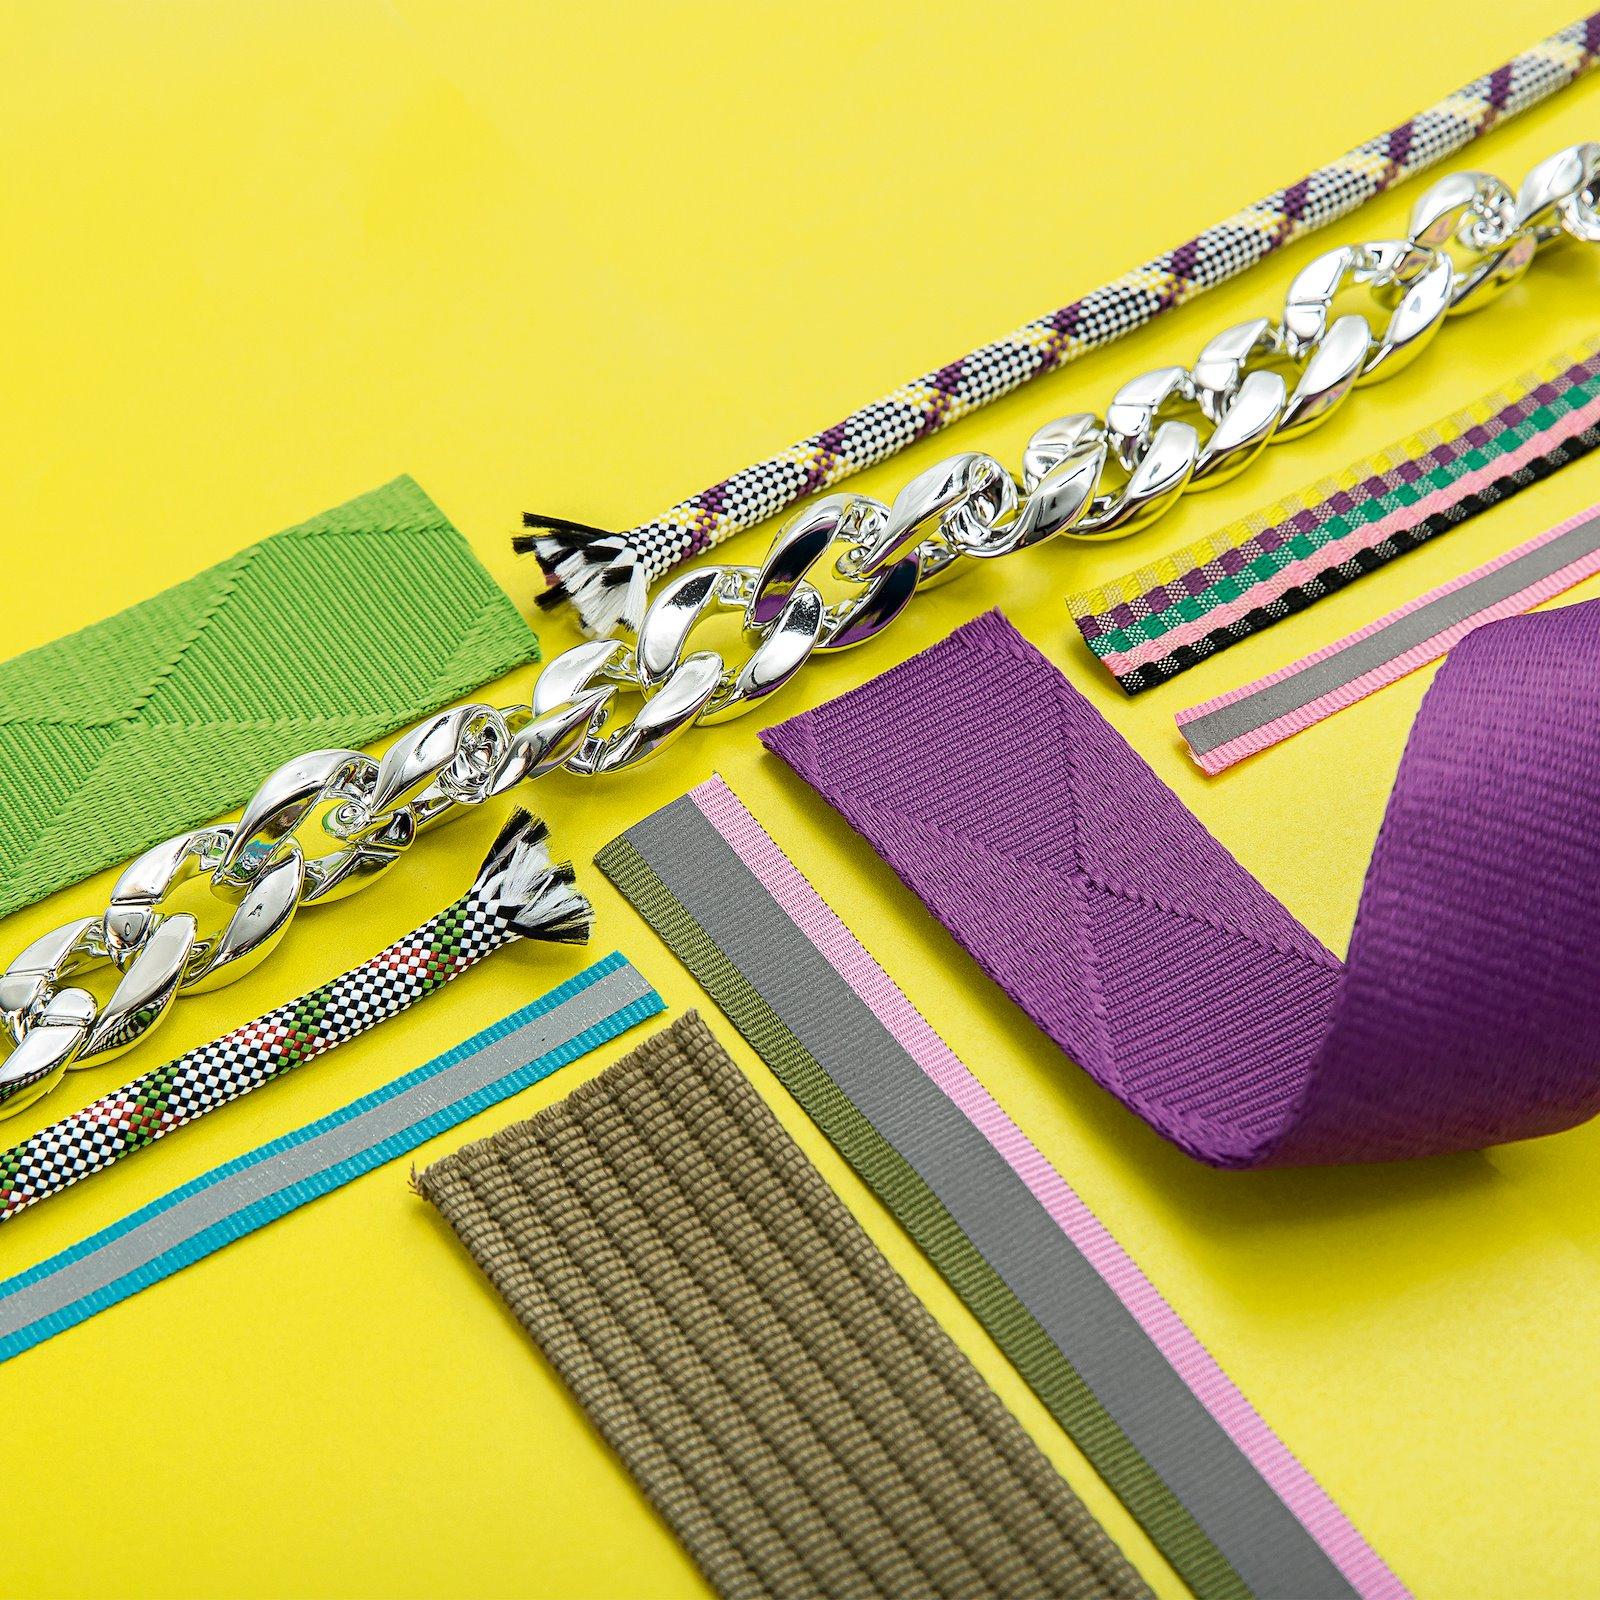 Ribbon reflex look 20mm violet/lime 2m 22292_22276_38100_22394_22201_22293_22200_22405_22202_22277_bundle